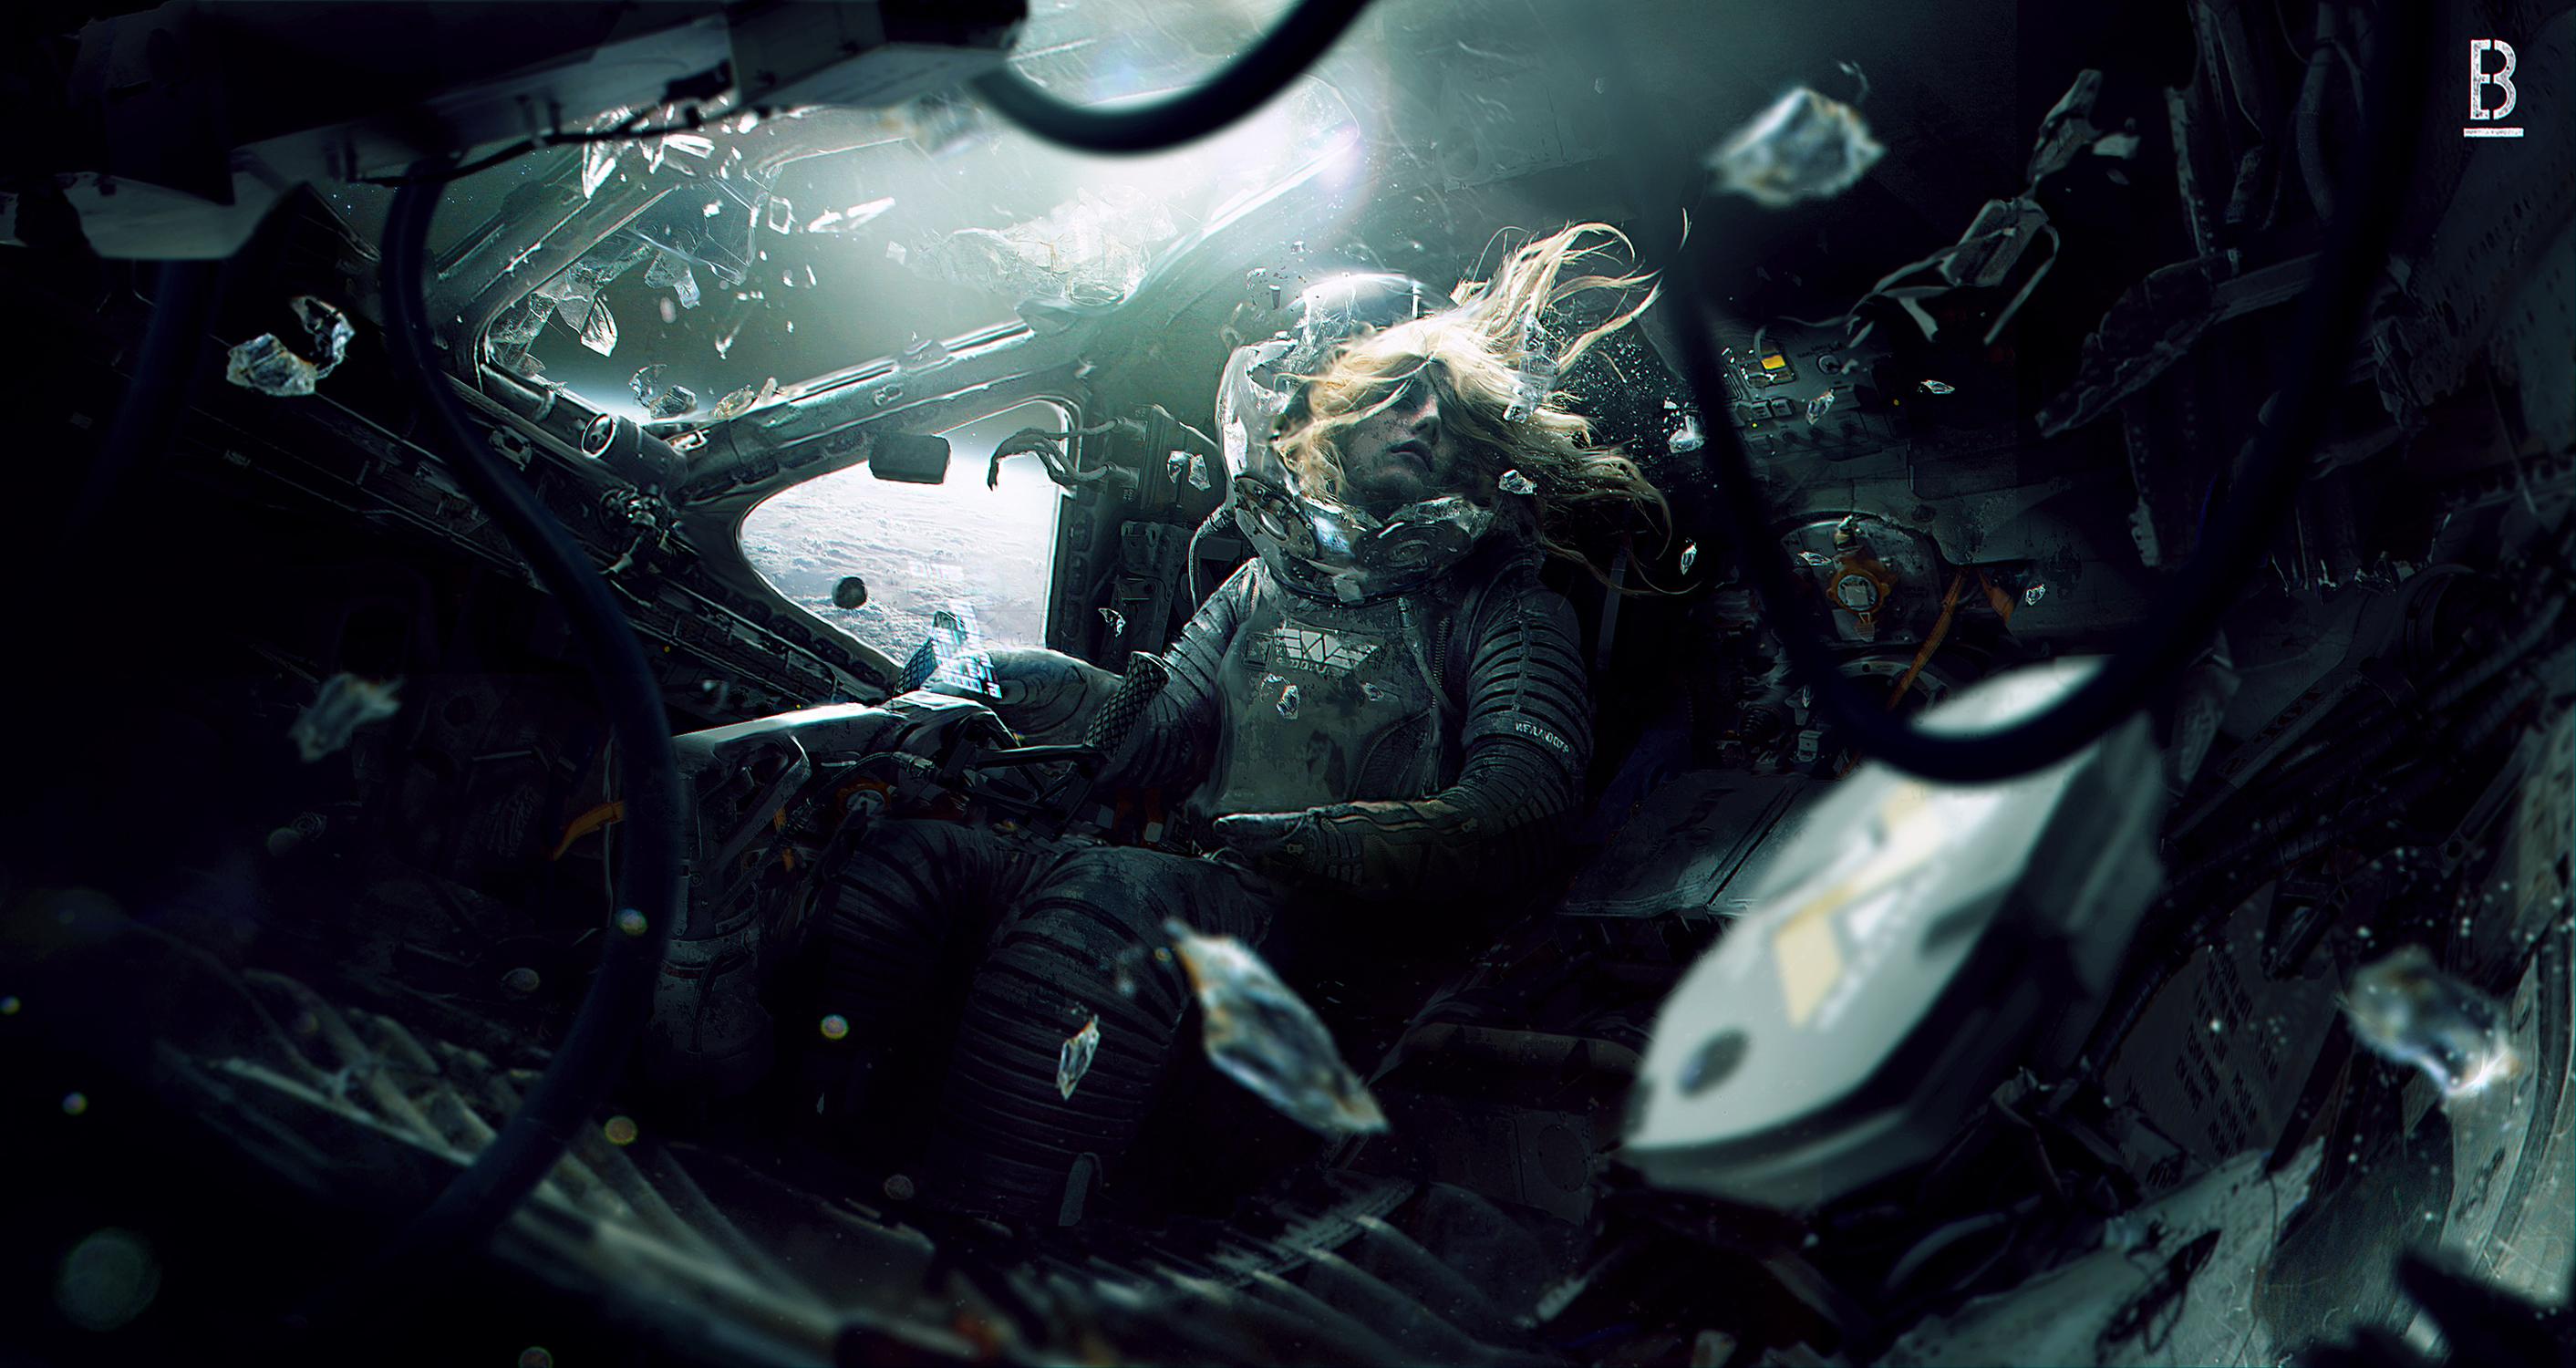 Weyland Yutani Shuttle failed escape from LV-426 Artwork by Benoit Godde